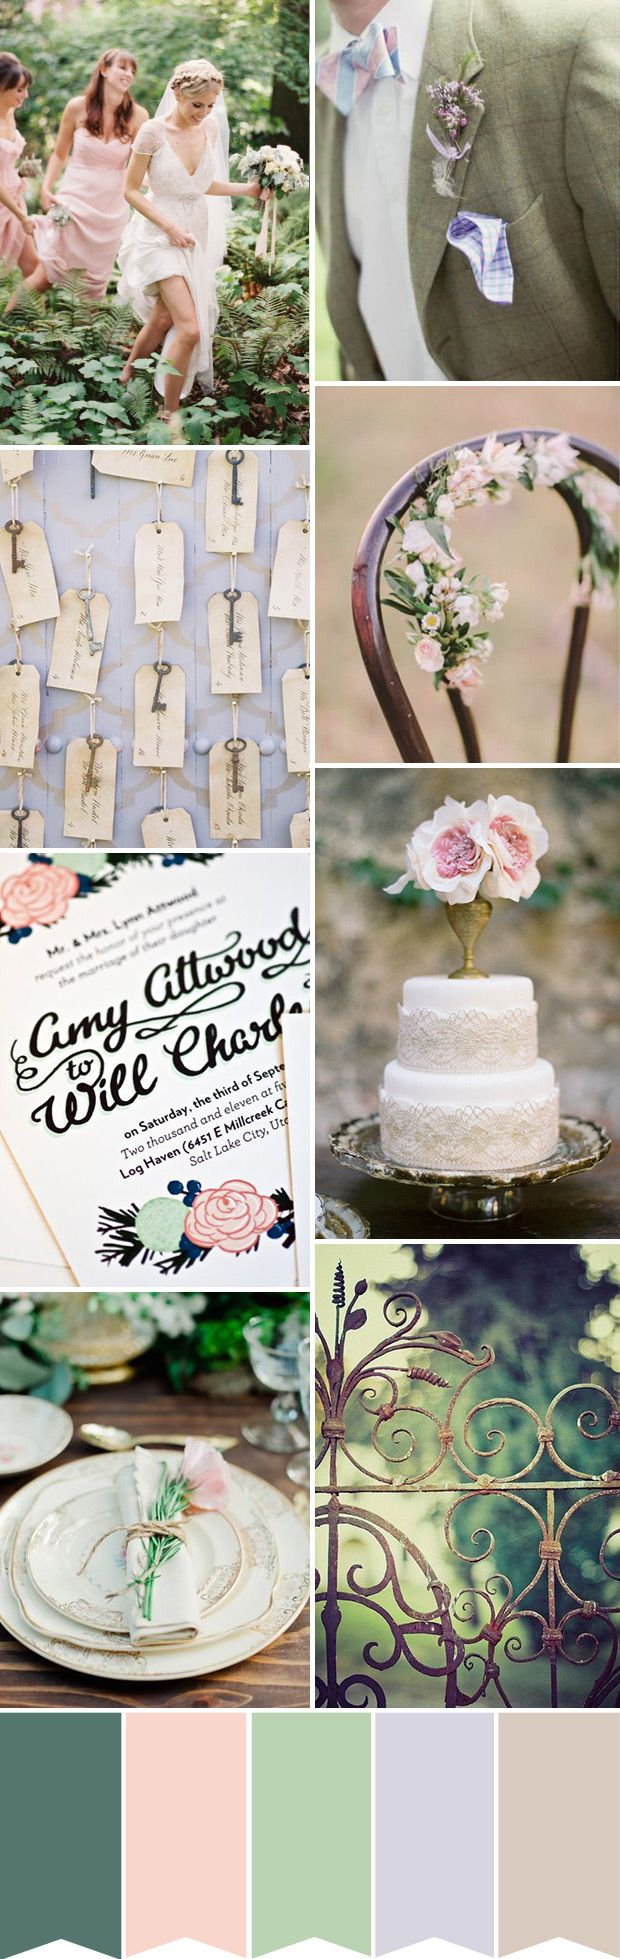 Wedding Color Palette of Blush Pink, Lilac, Purple, Sage Green - Secret Garden Wedding Inspiration